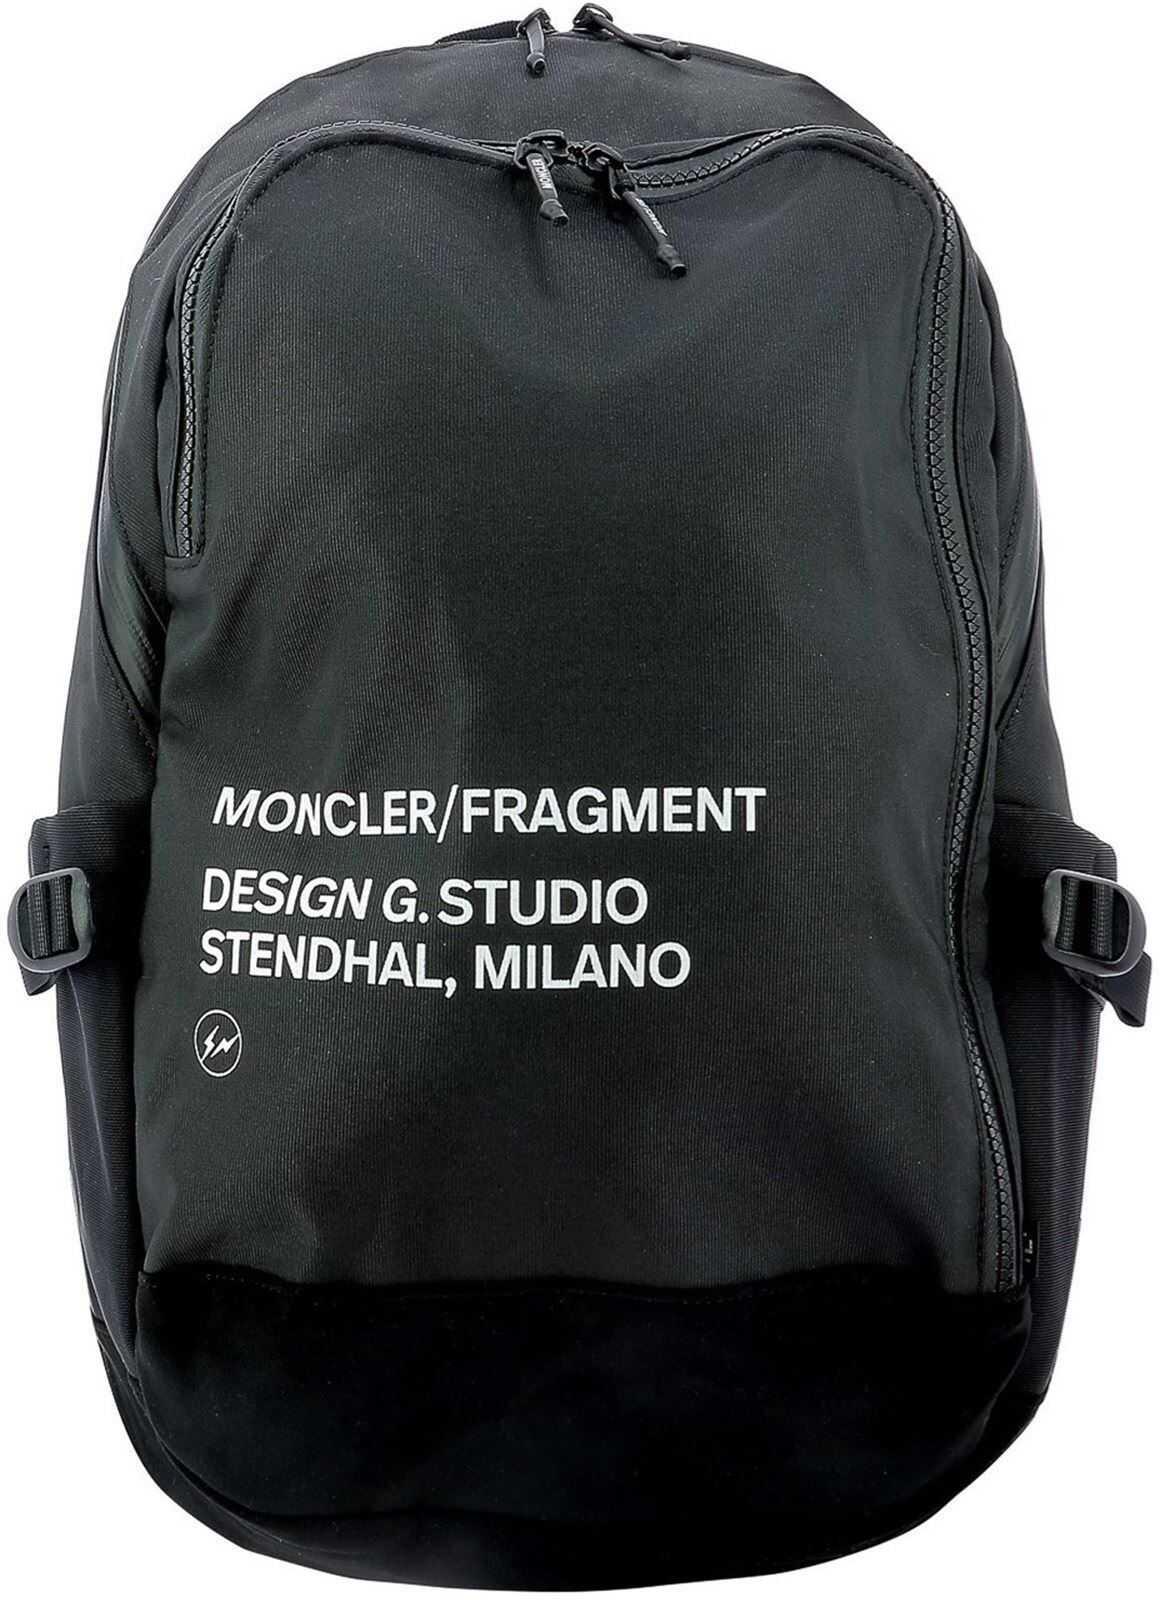 Moncler 7 Moncler Fragment Backpack In Black 5A70000 02SLR 999 Black imagine b-mall.ro